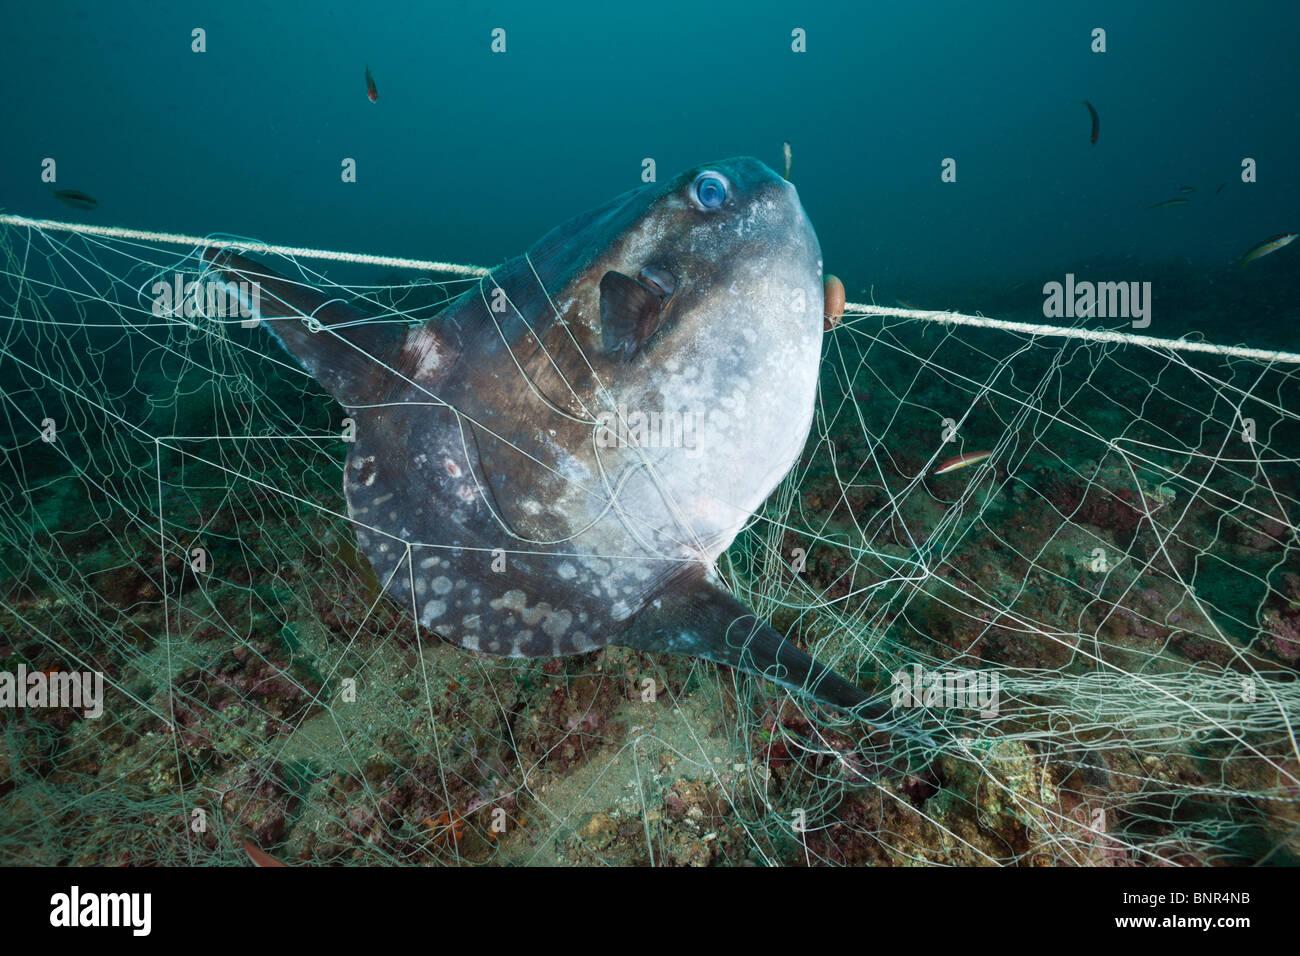 Mondfische gefangen im verlorenen Fischen Net, Mola Mola, Cap de Creus, Costa Brava, Spanien Stockbild